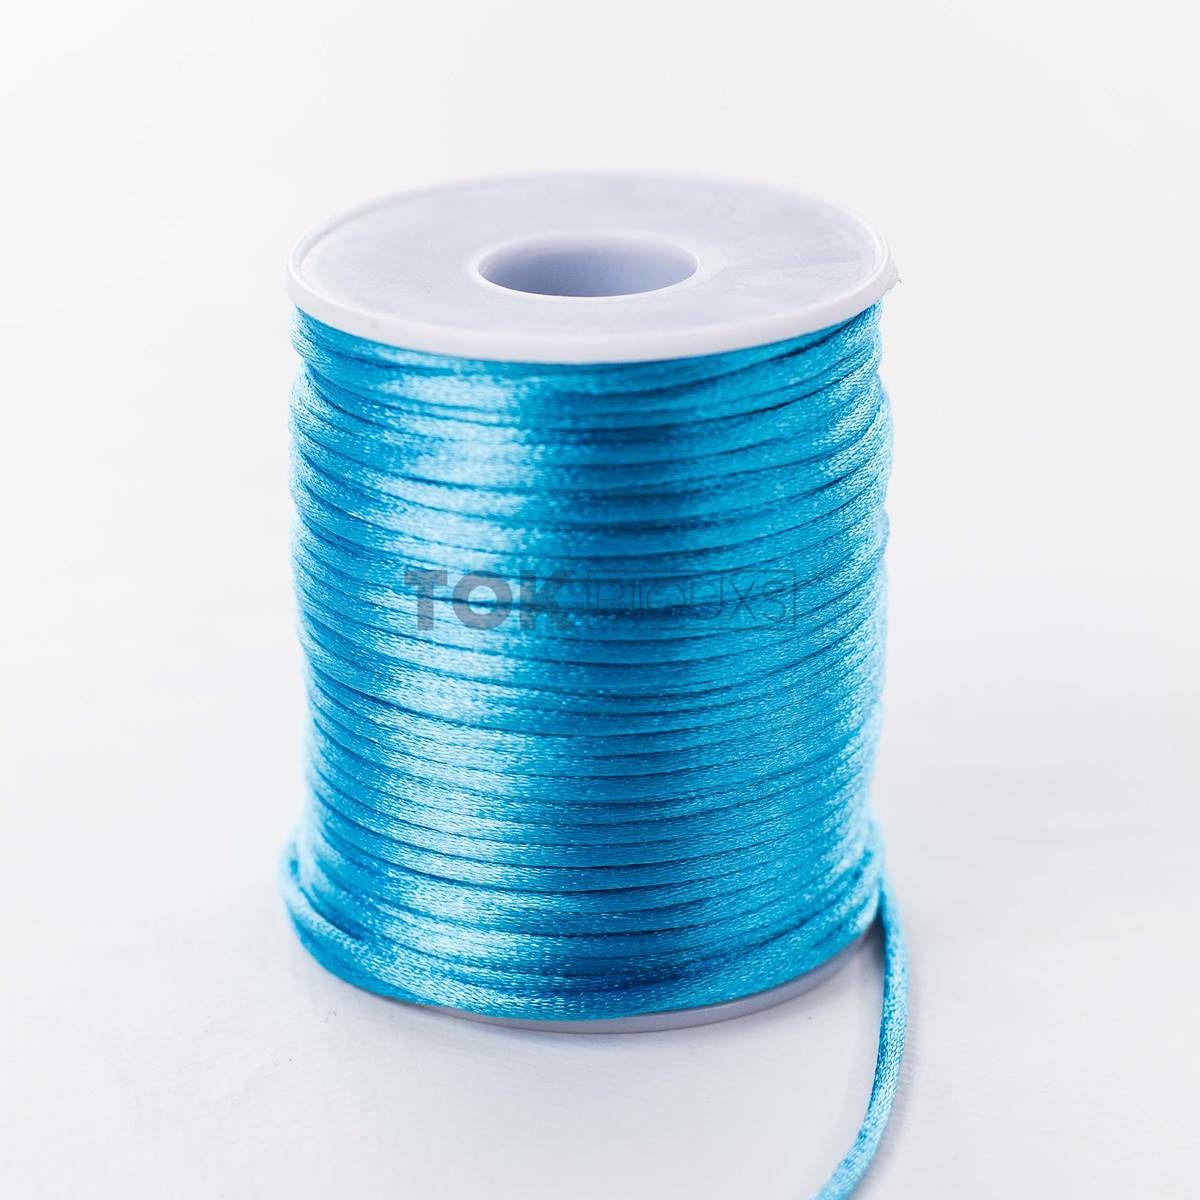 Cordão Cetim 2mm - 50 Metros - Azul Turquesa